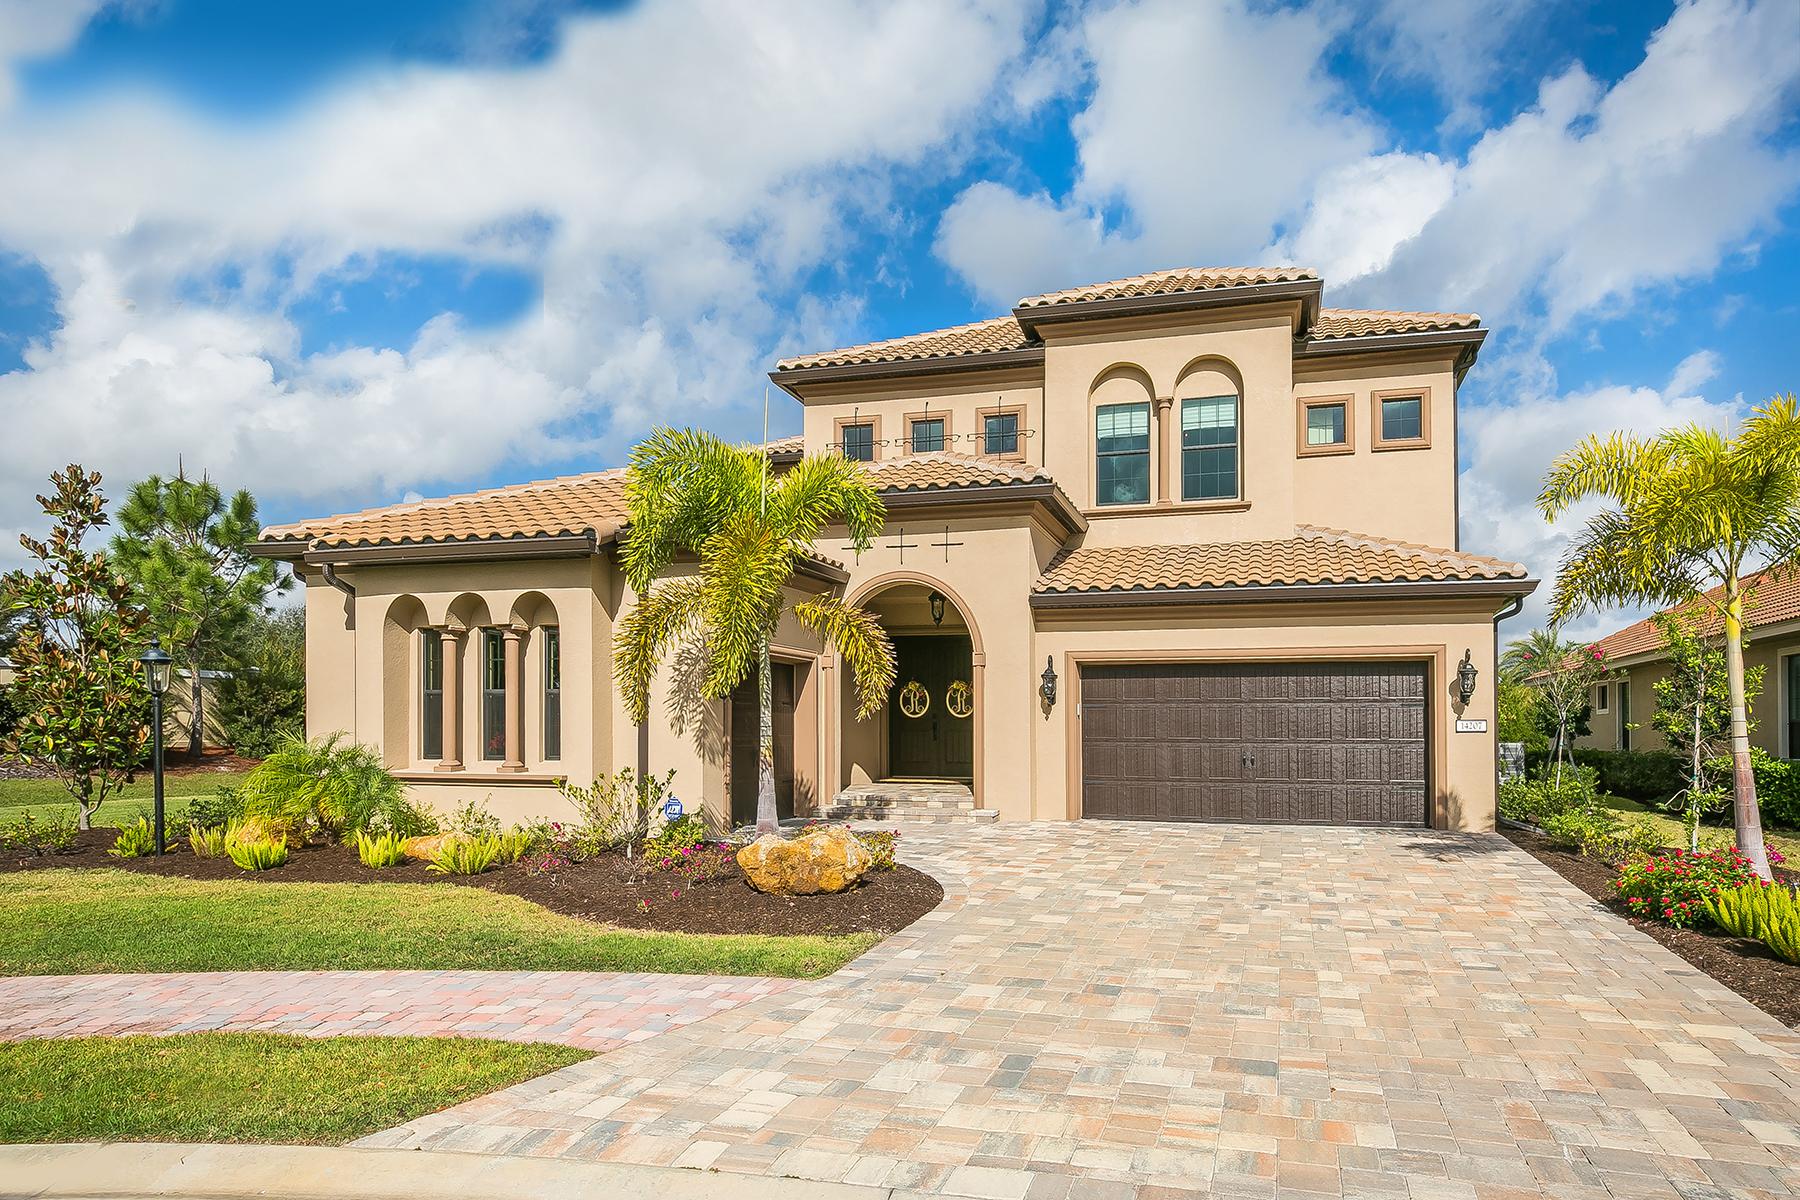 獨棟家庭住宅 為 出售 在 LAKEWOOD RANCH COUNTRY CLUB EAST 14207 Woodhall Pl Bradenton, 佛羅里達州, 34202 美國